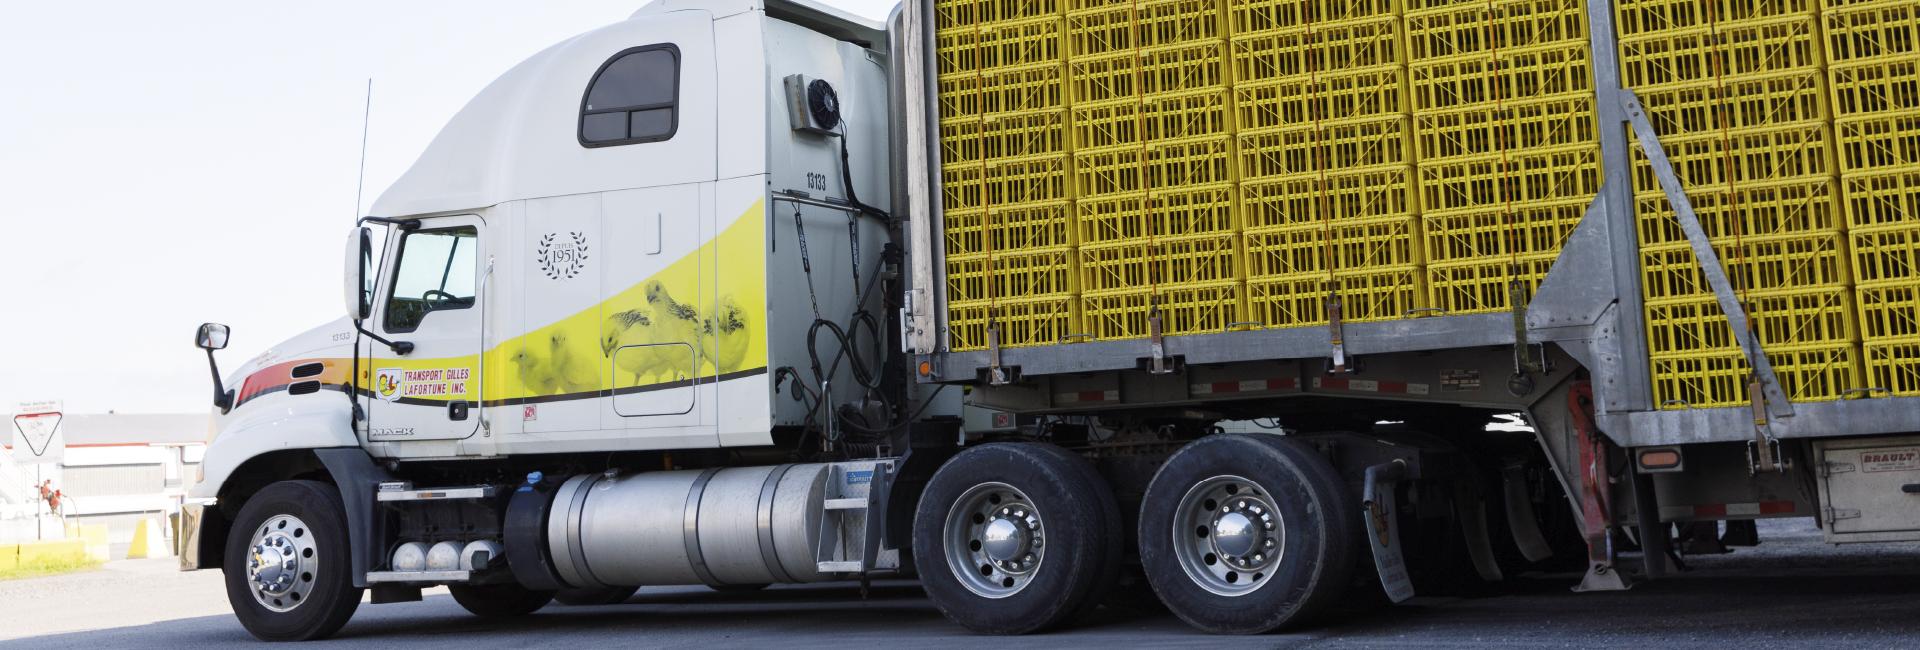 Volailles-transport-gilles-lafortune-services-header